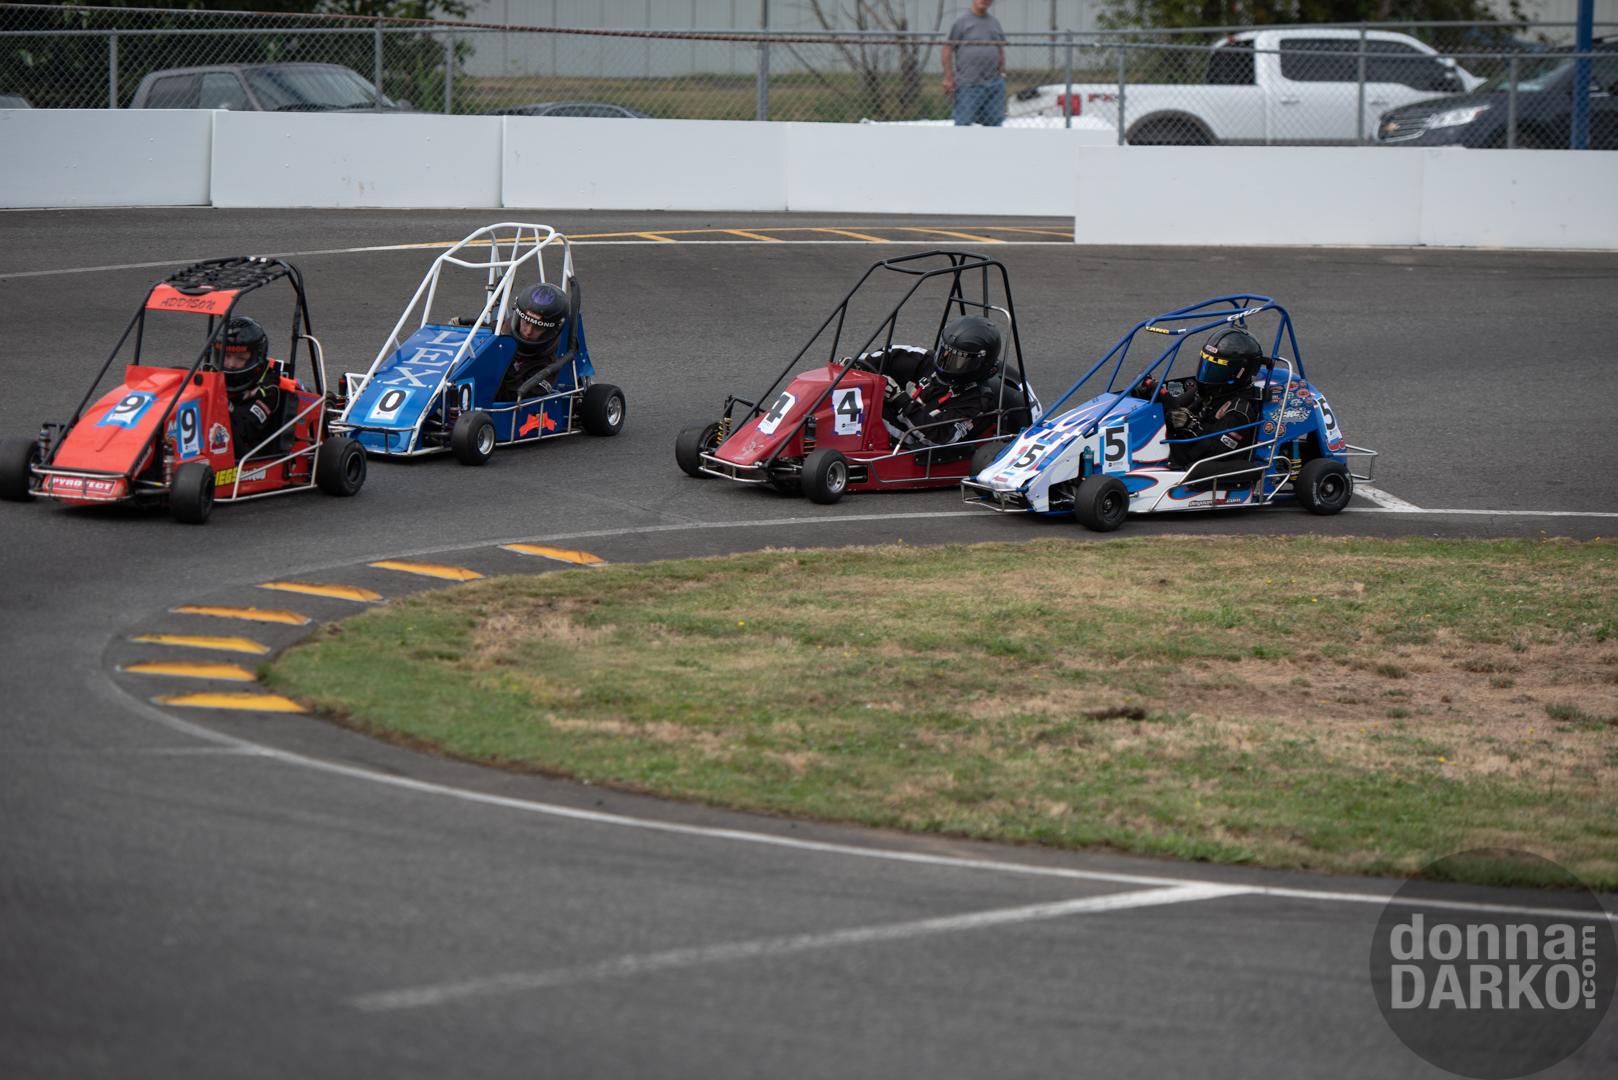 QWMA (Racing) 8-11-2019 DSC_7915.jpg